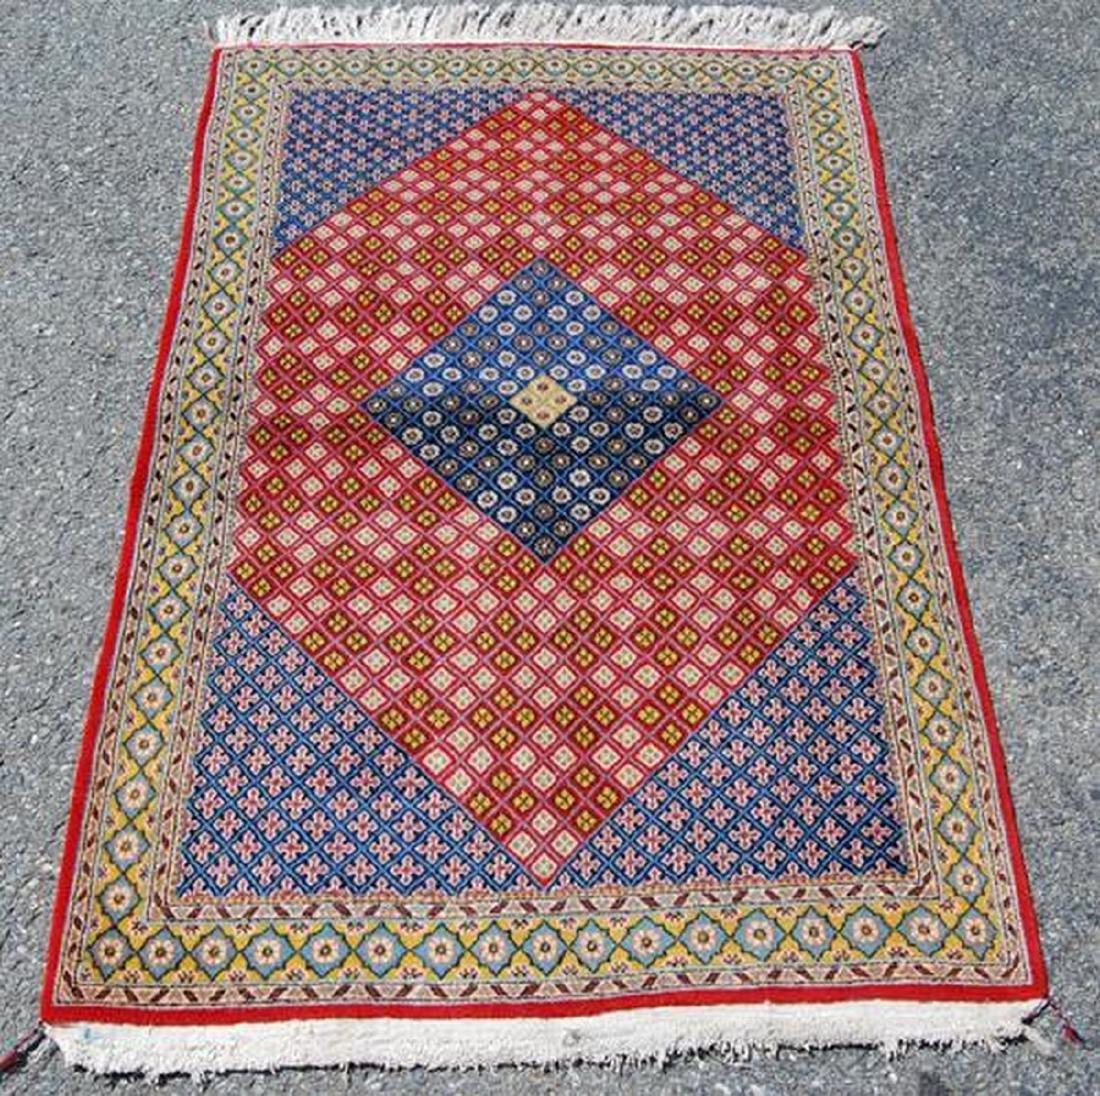 Handmade Persian Mahal Rug 4.9x3.5